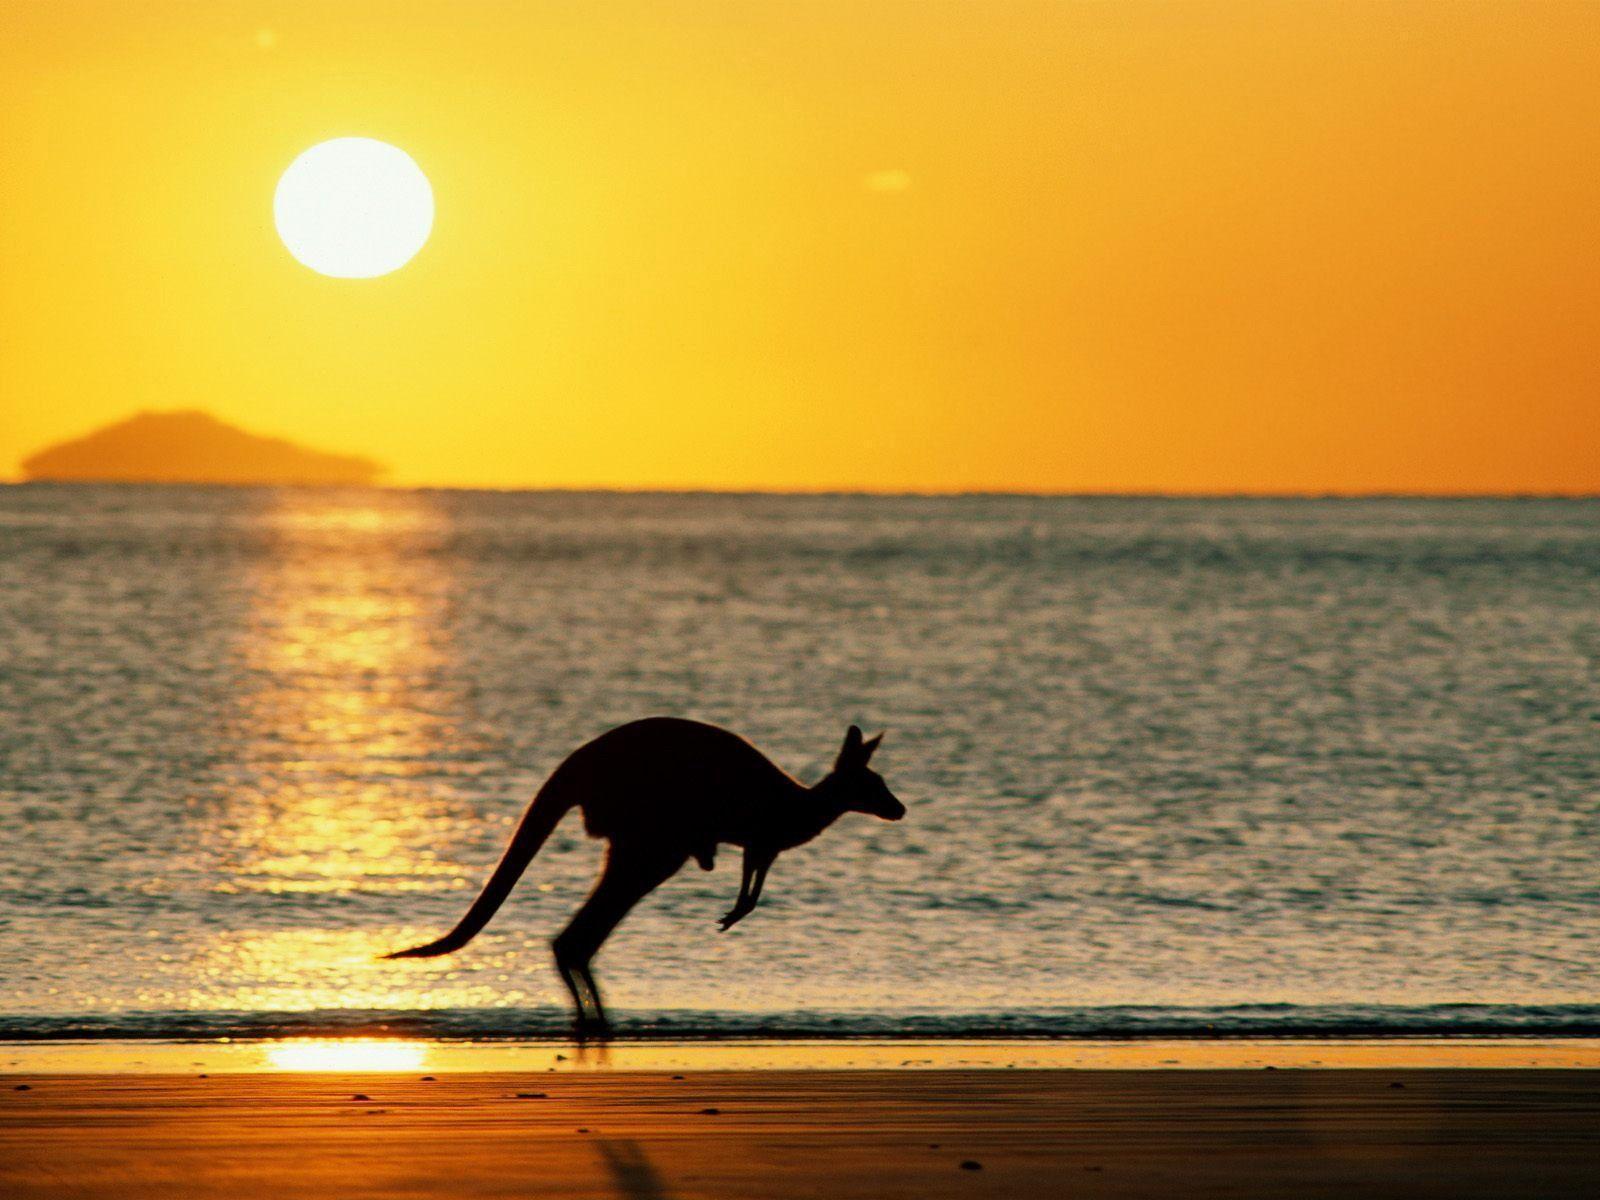 Download Kangaroo Wallpaper 1600x1200 | Full HD Wallpapers